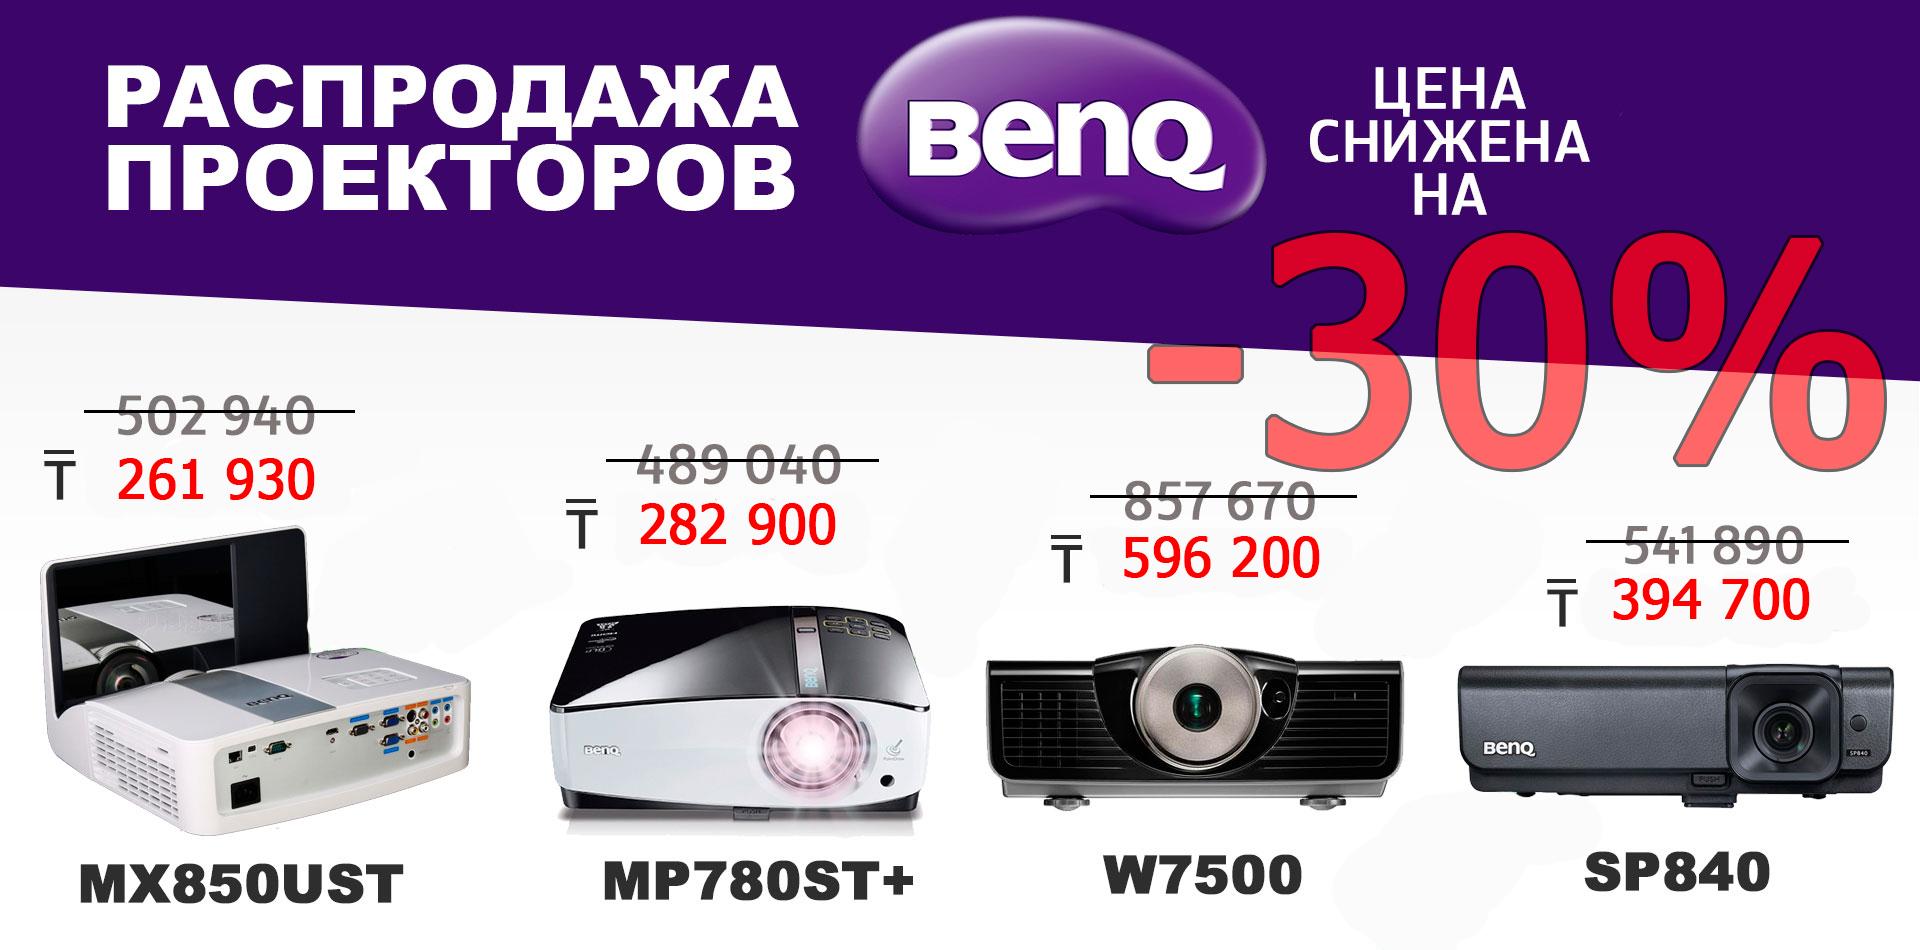 Проектор Benq